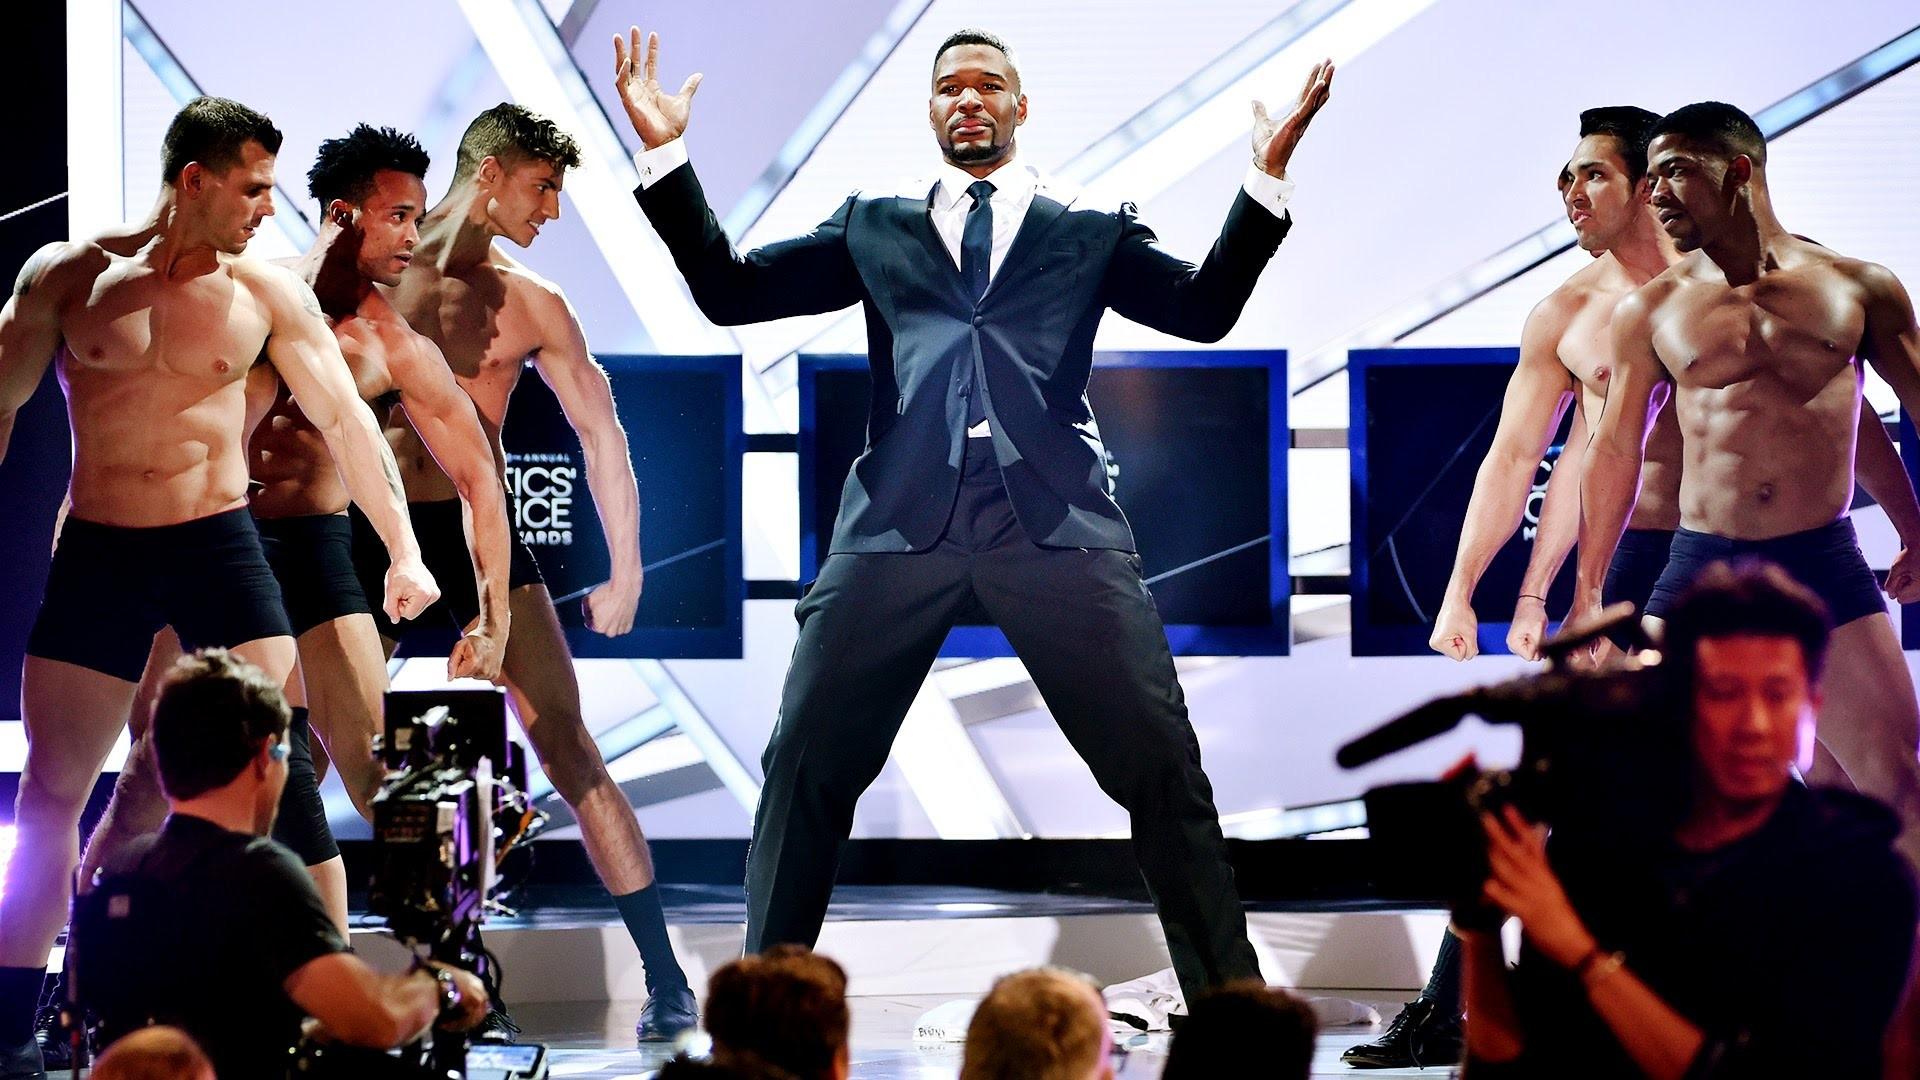 Awkward Magic Mike 2 Striptease Opening at Critics' Choice Movie Awards –  YouTube